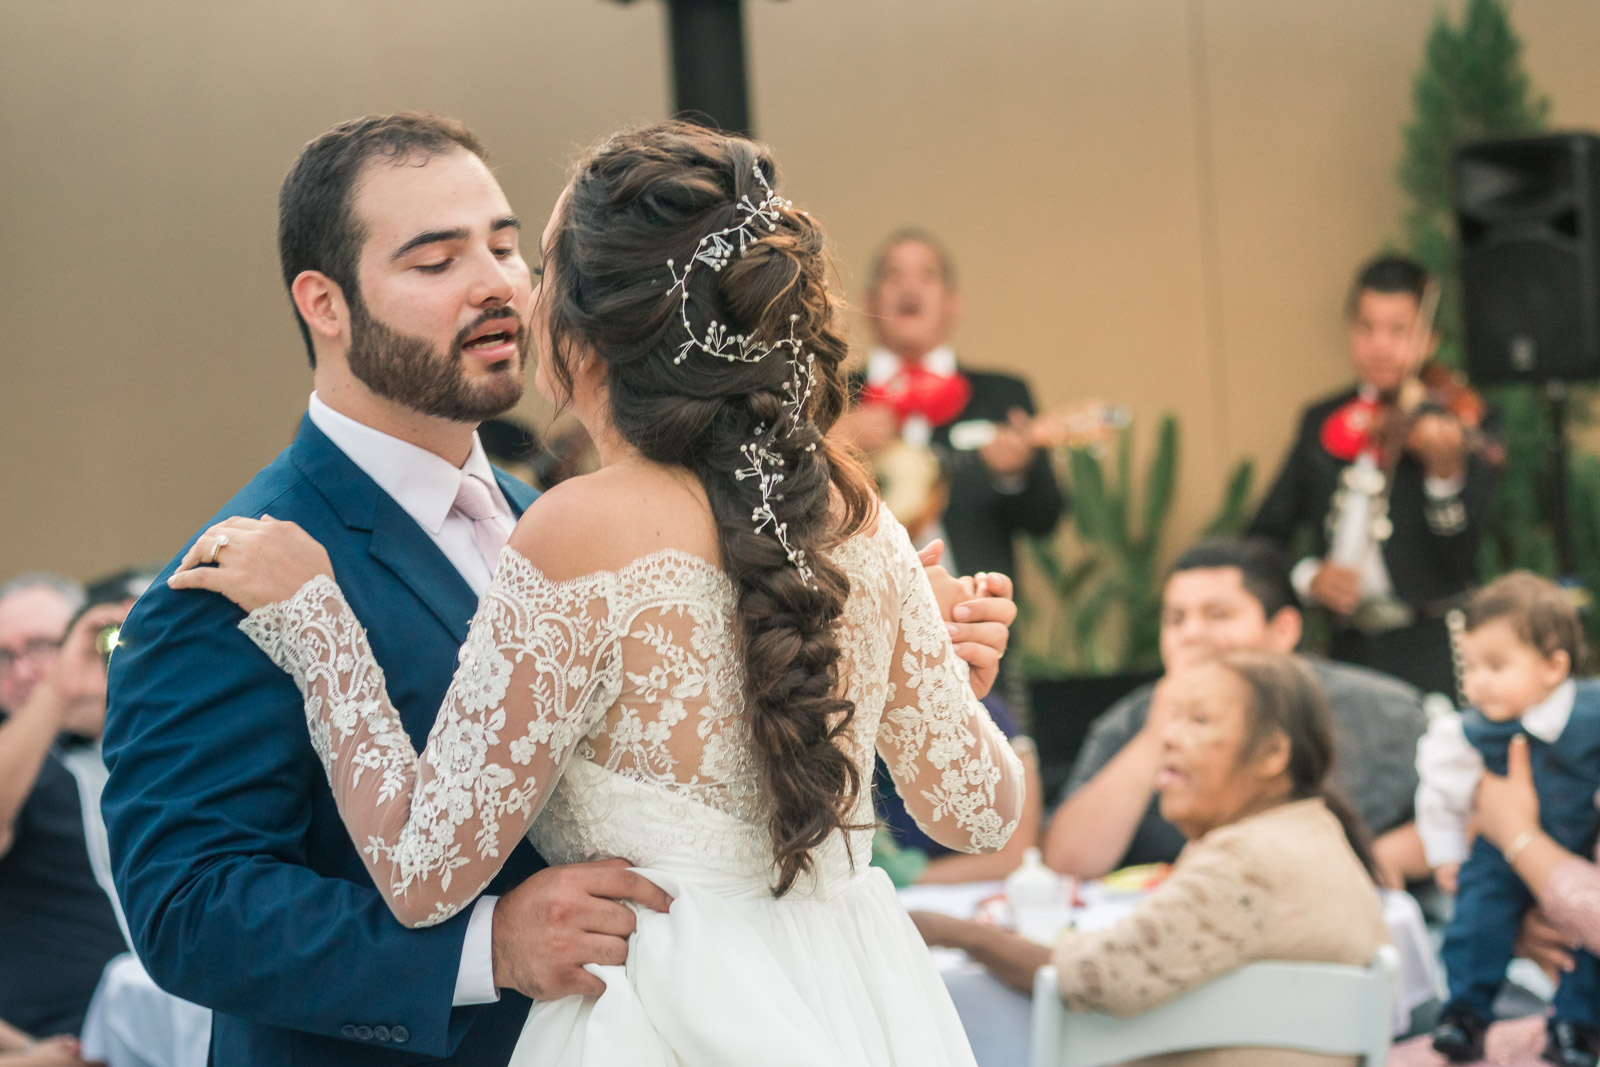 352_Angel-Brea-Orange-County_Joseph-Barber-Wedding-Photography.jpg